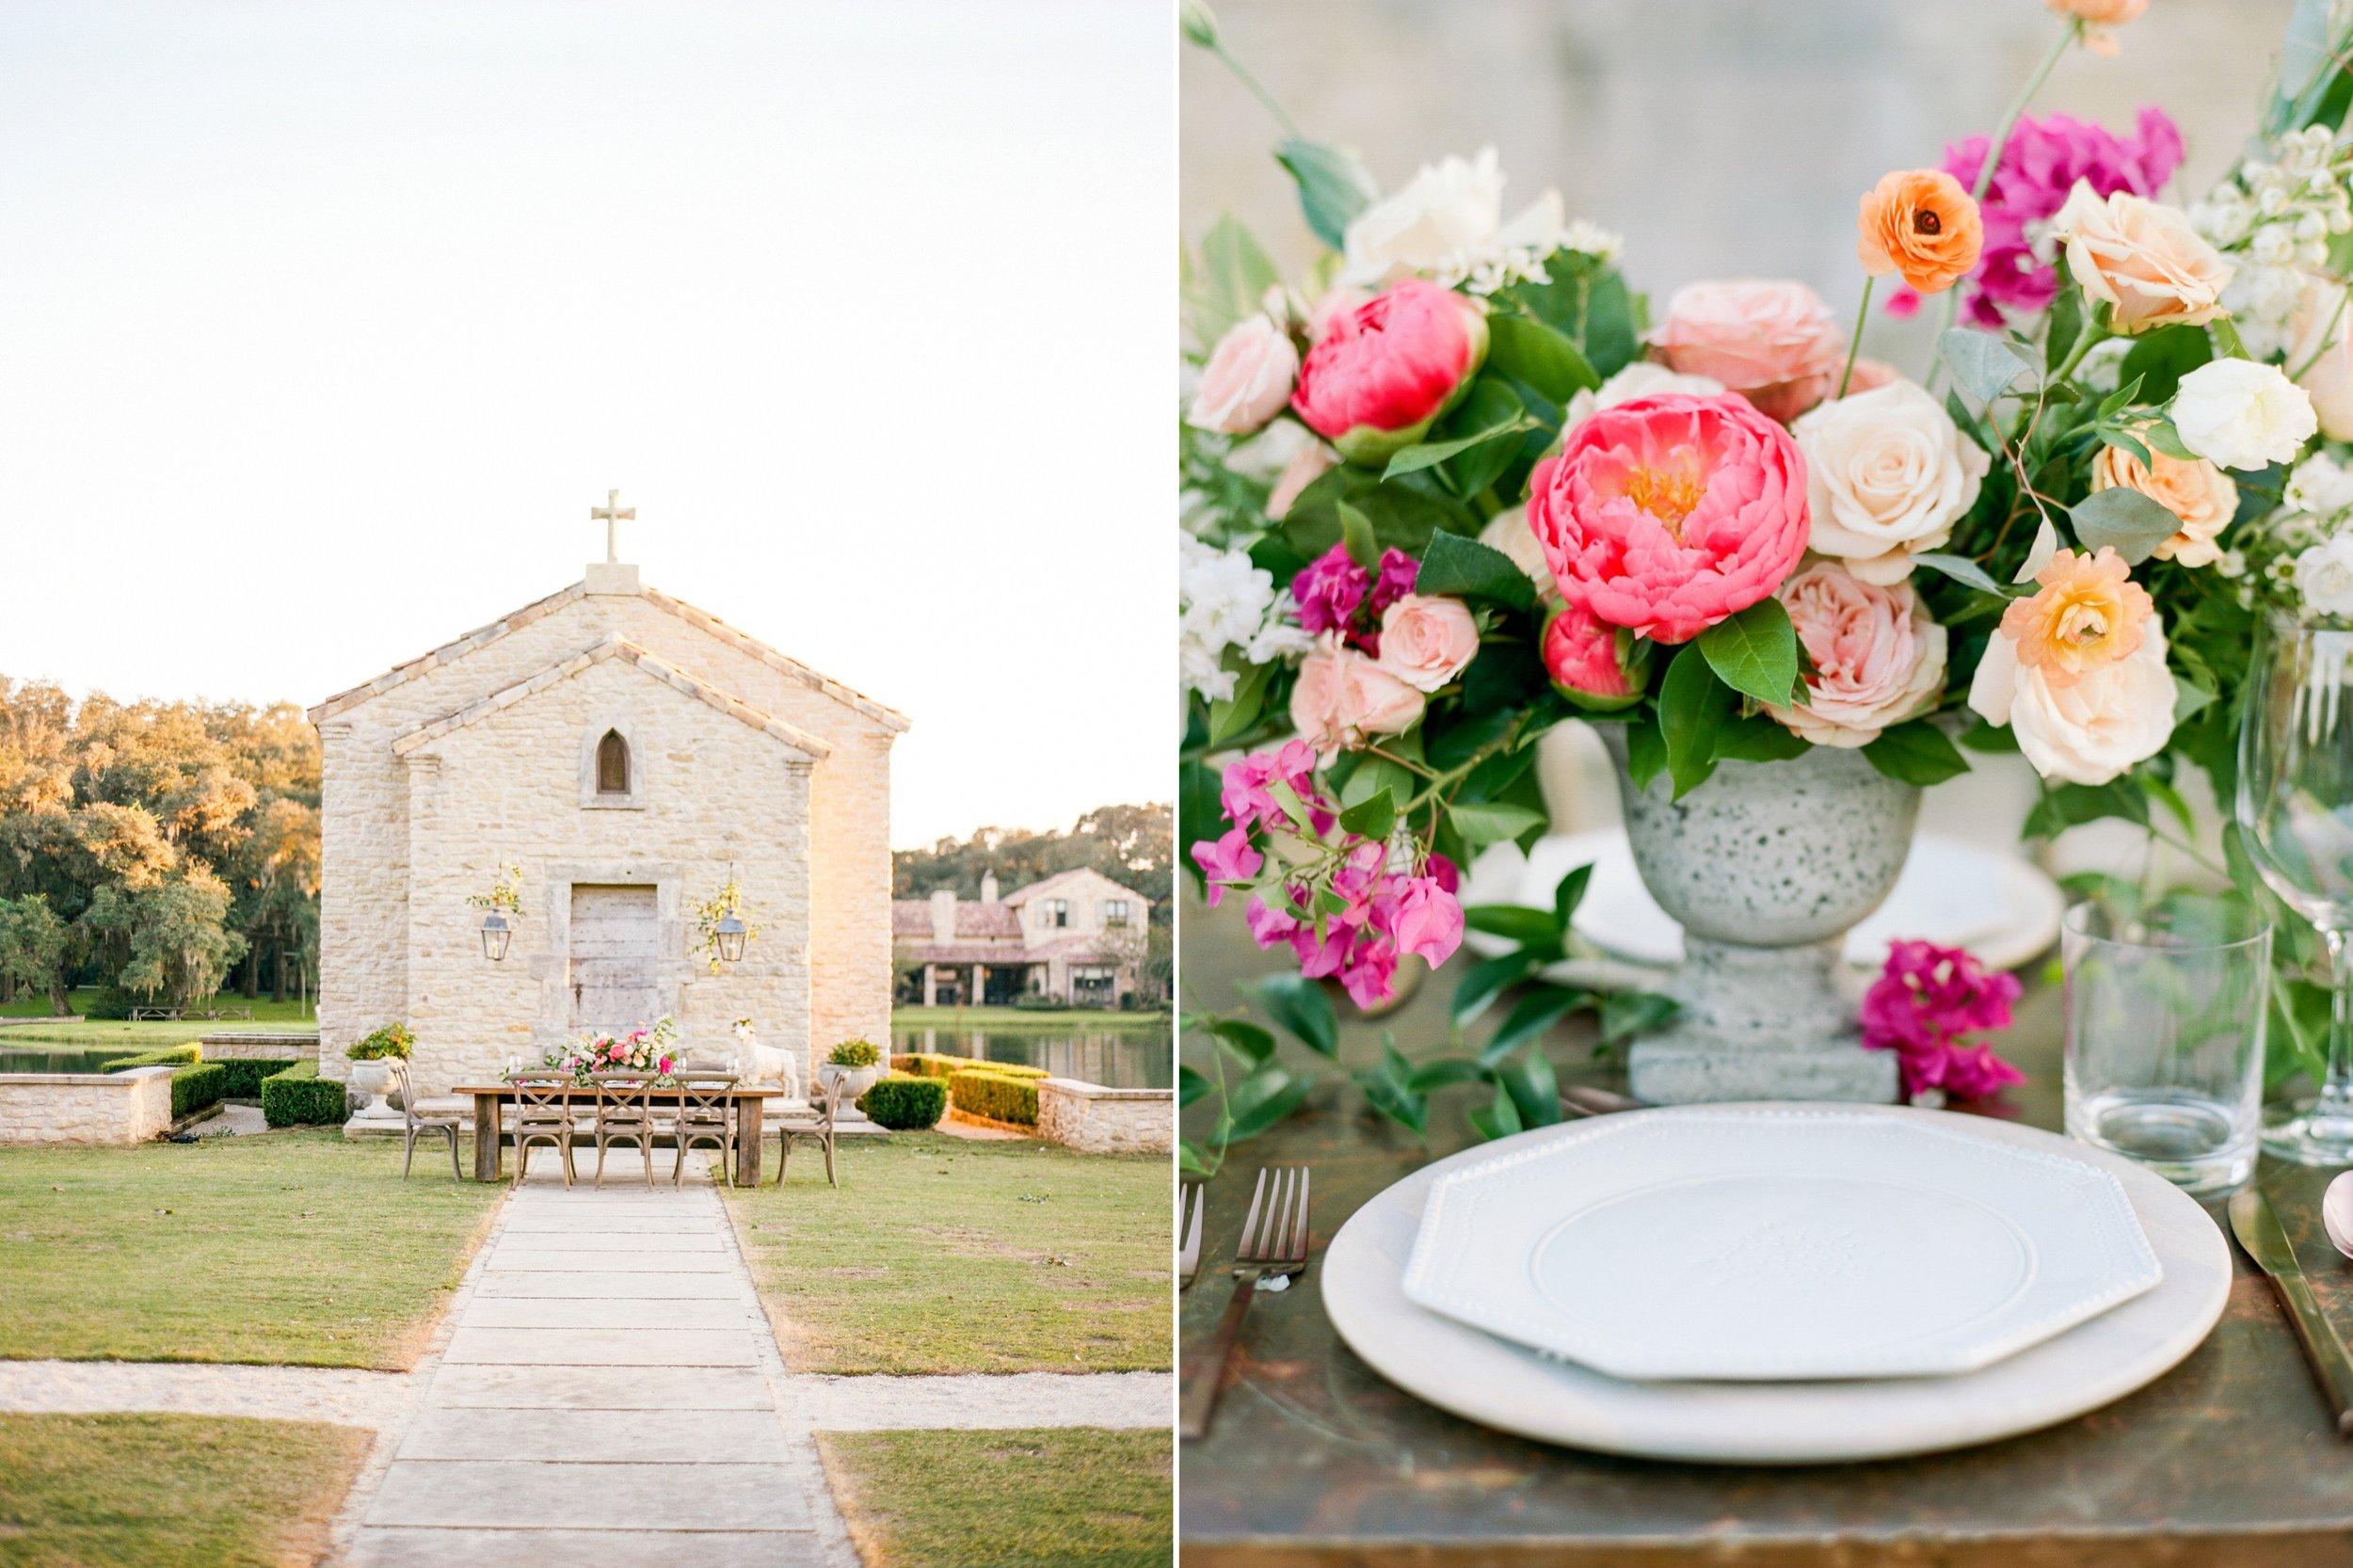 the-clubs-at-houston-oaks-wedding-houston-oaks-wedding-ceremony-houston-oaks-chapel-belle-of-the-ball-dana-fernandez-photography-houston-wedding-photographer-luxury-film-fine-art-103.jpg